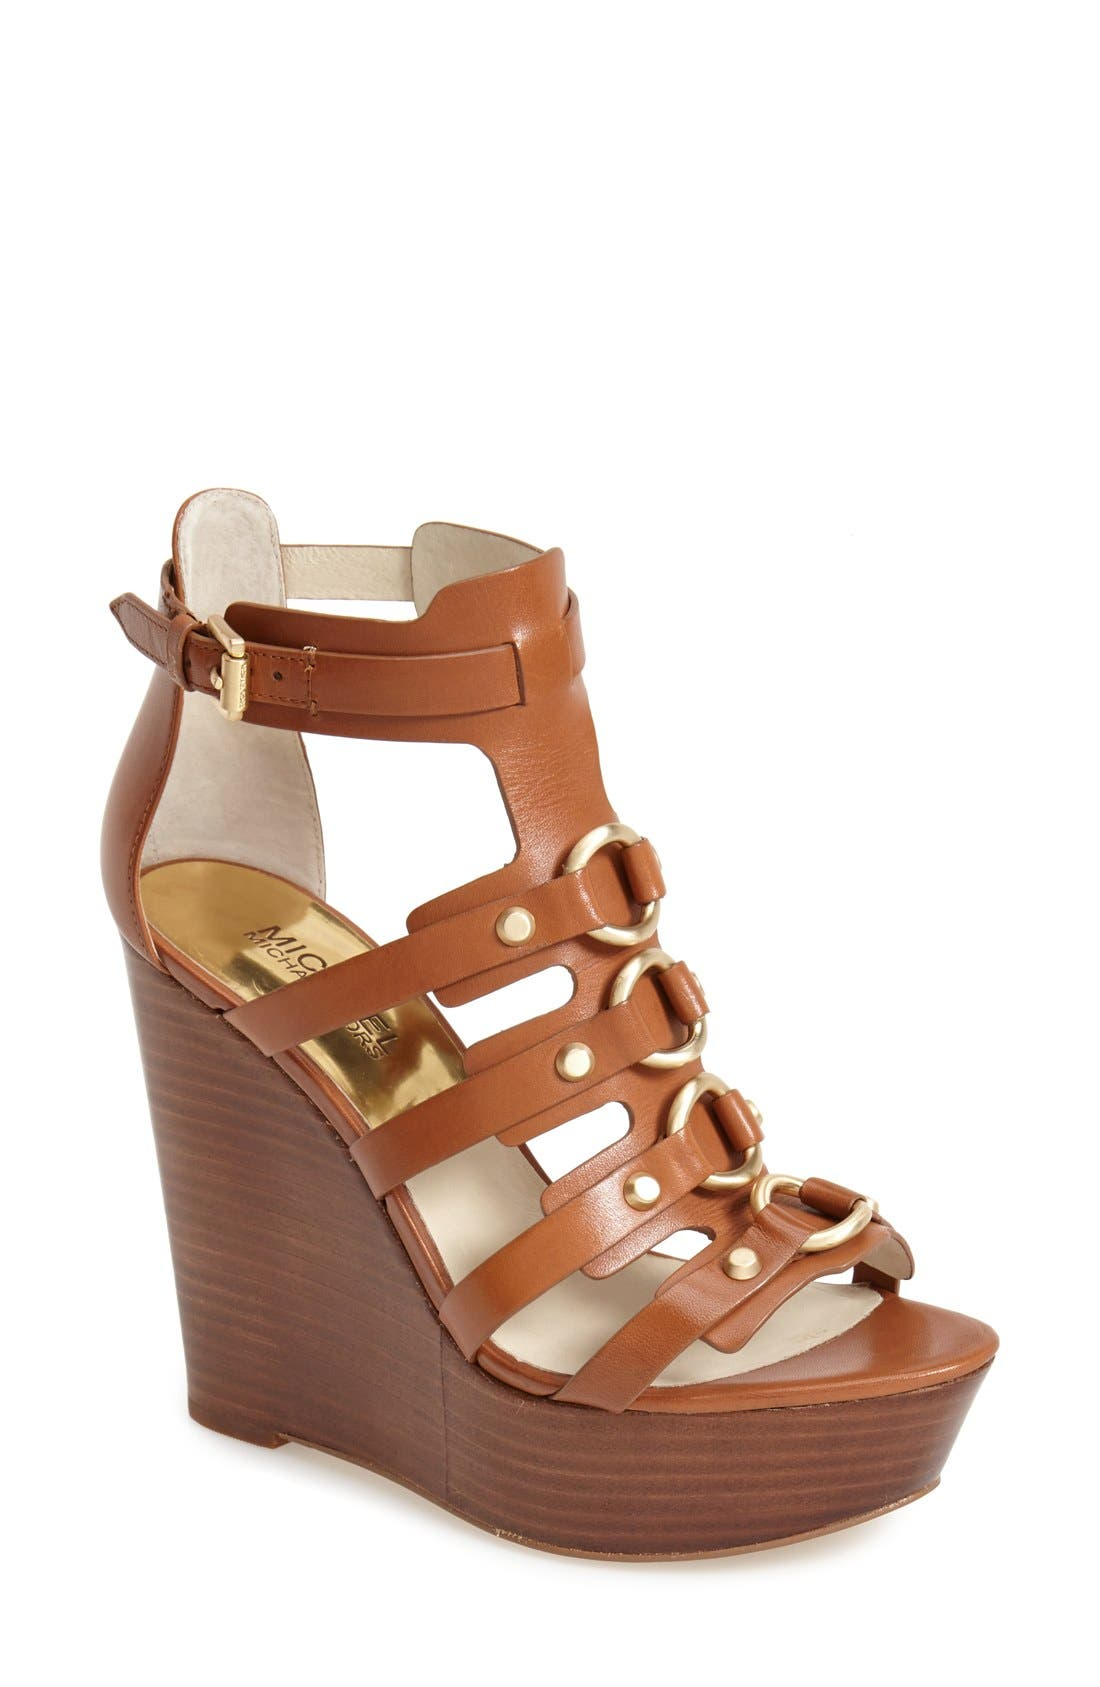 Alternate Image 1 Selected - MICHAEL Michael Kors 'Nadine' Platform Wedge Sandal (Women)